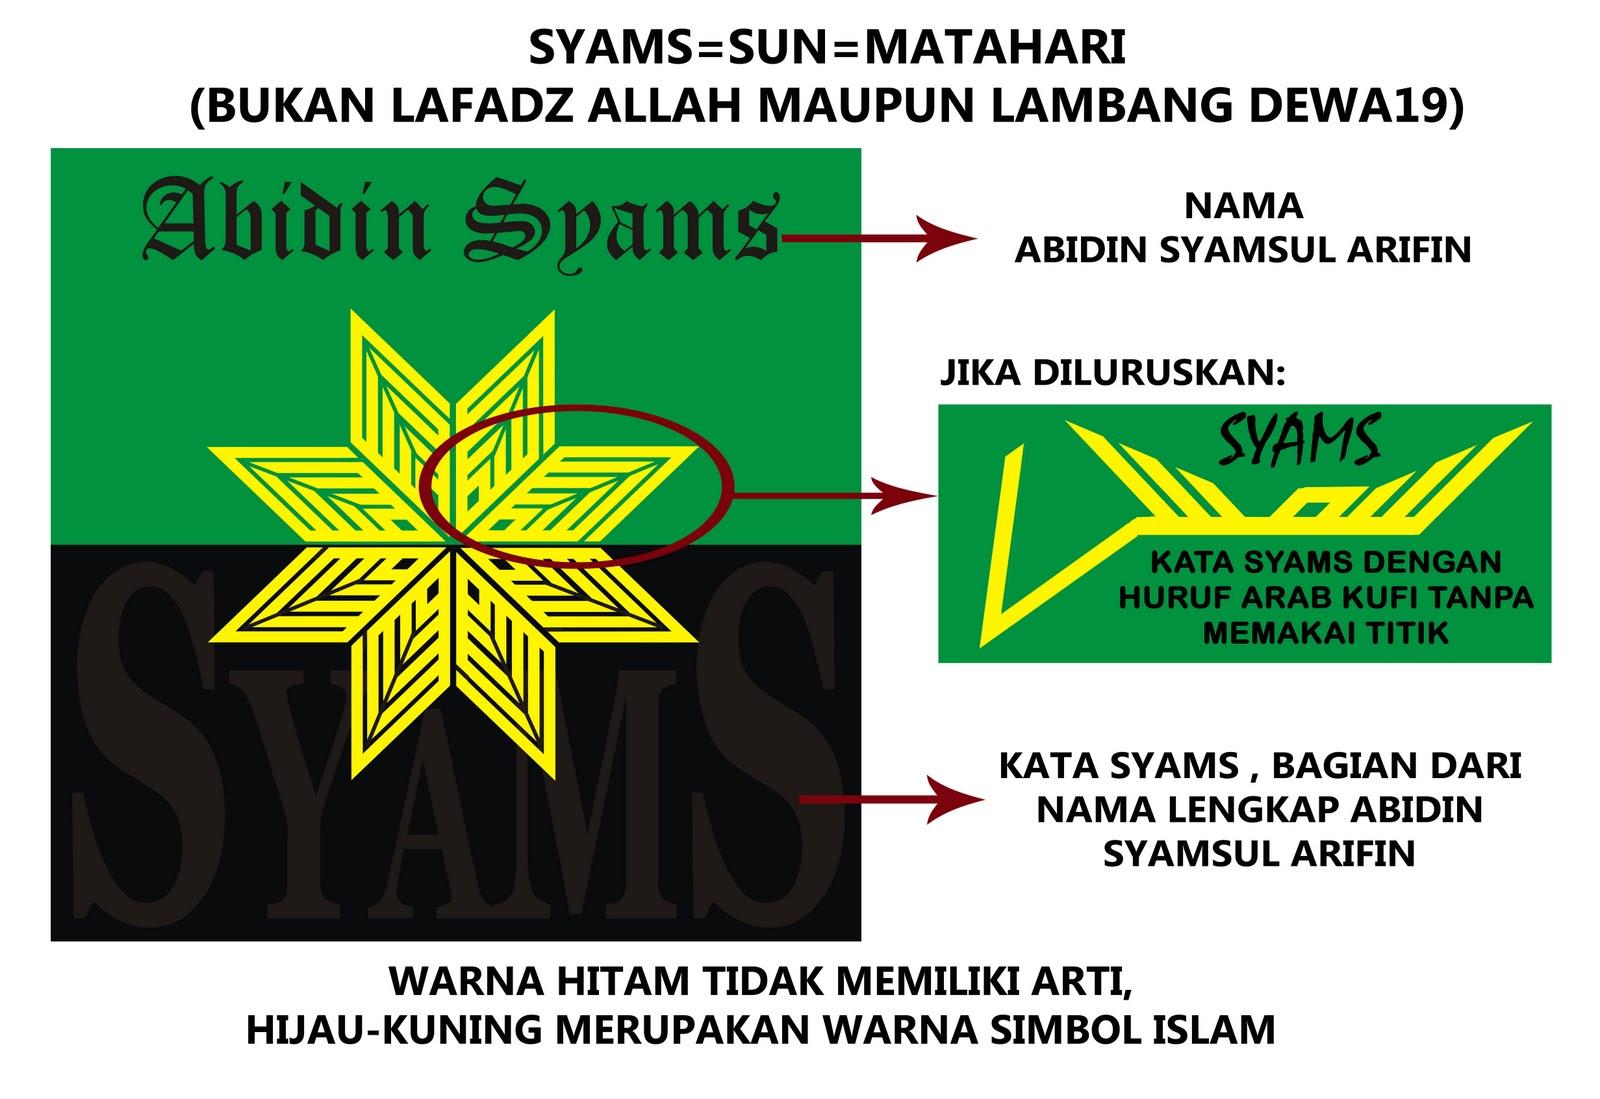 SYAMS AKATSUKI 007: Logo SYAMS